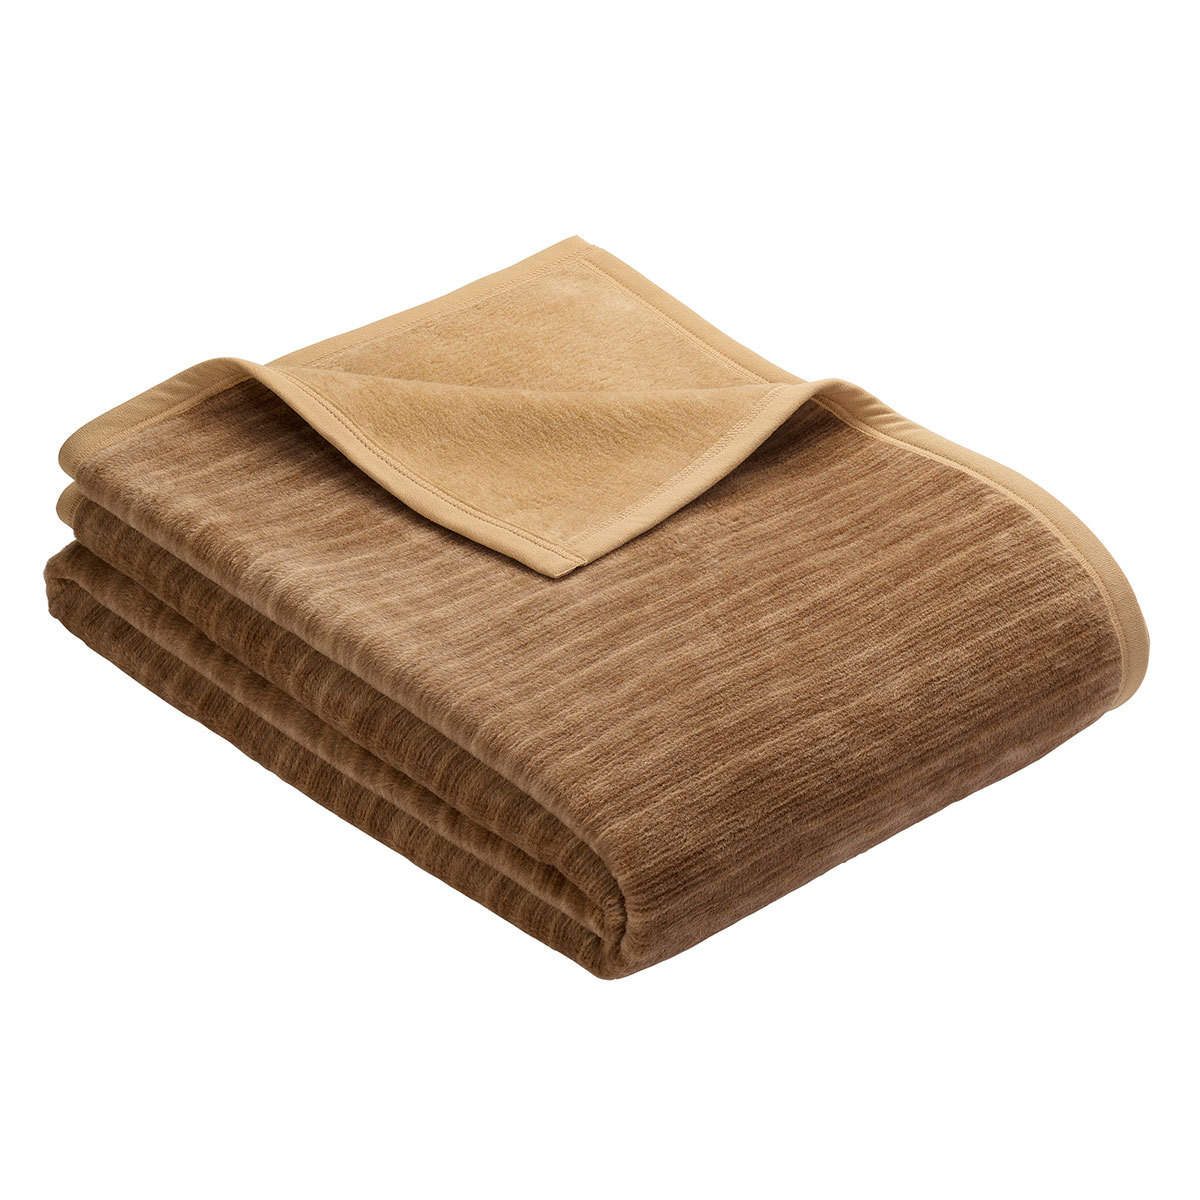 ibena jacquard decke fano g nstig online kaufen bei. Black Bedroom Furniture Sets. Home Design Ideas